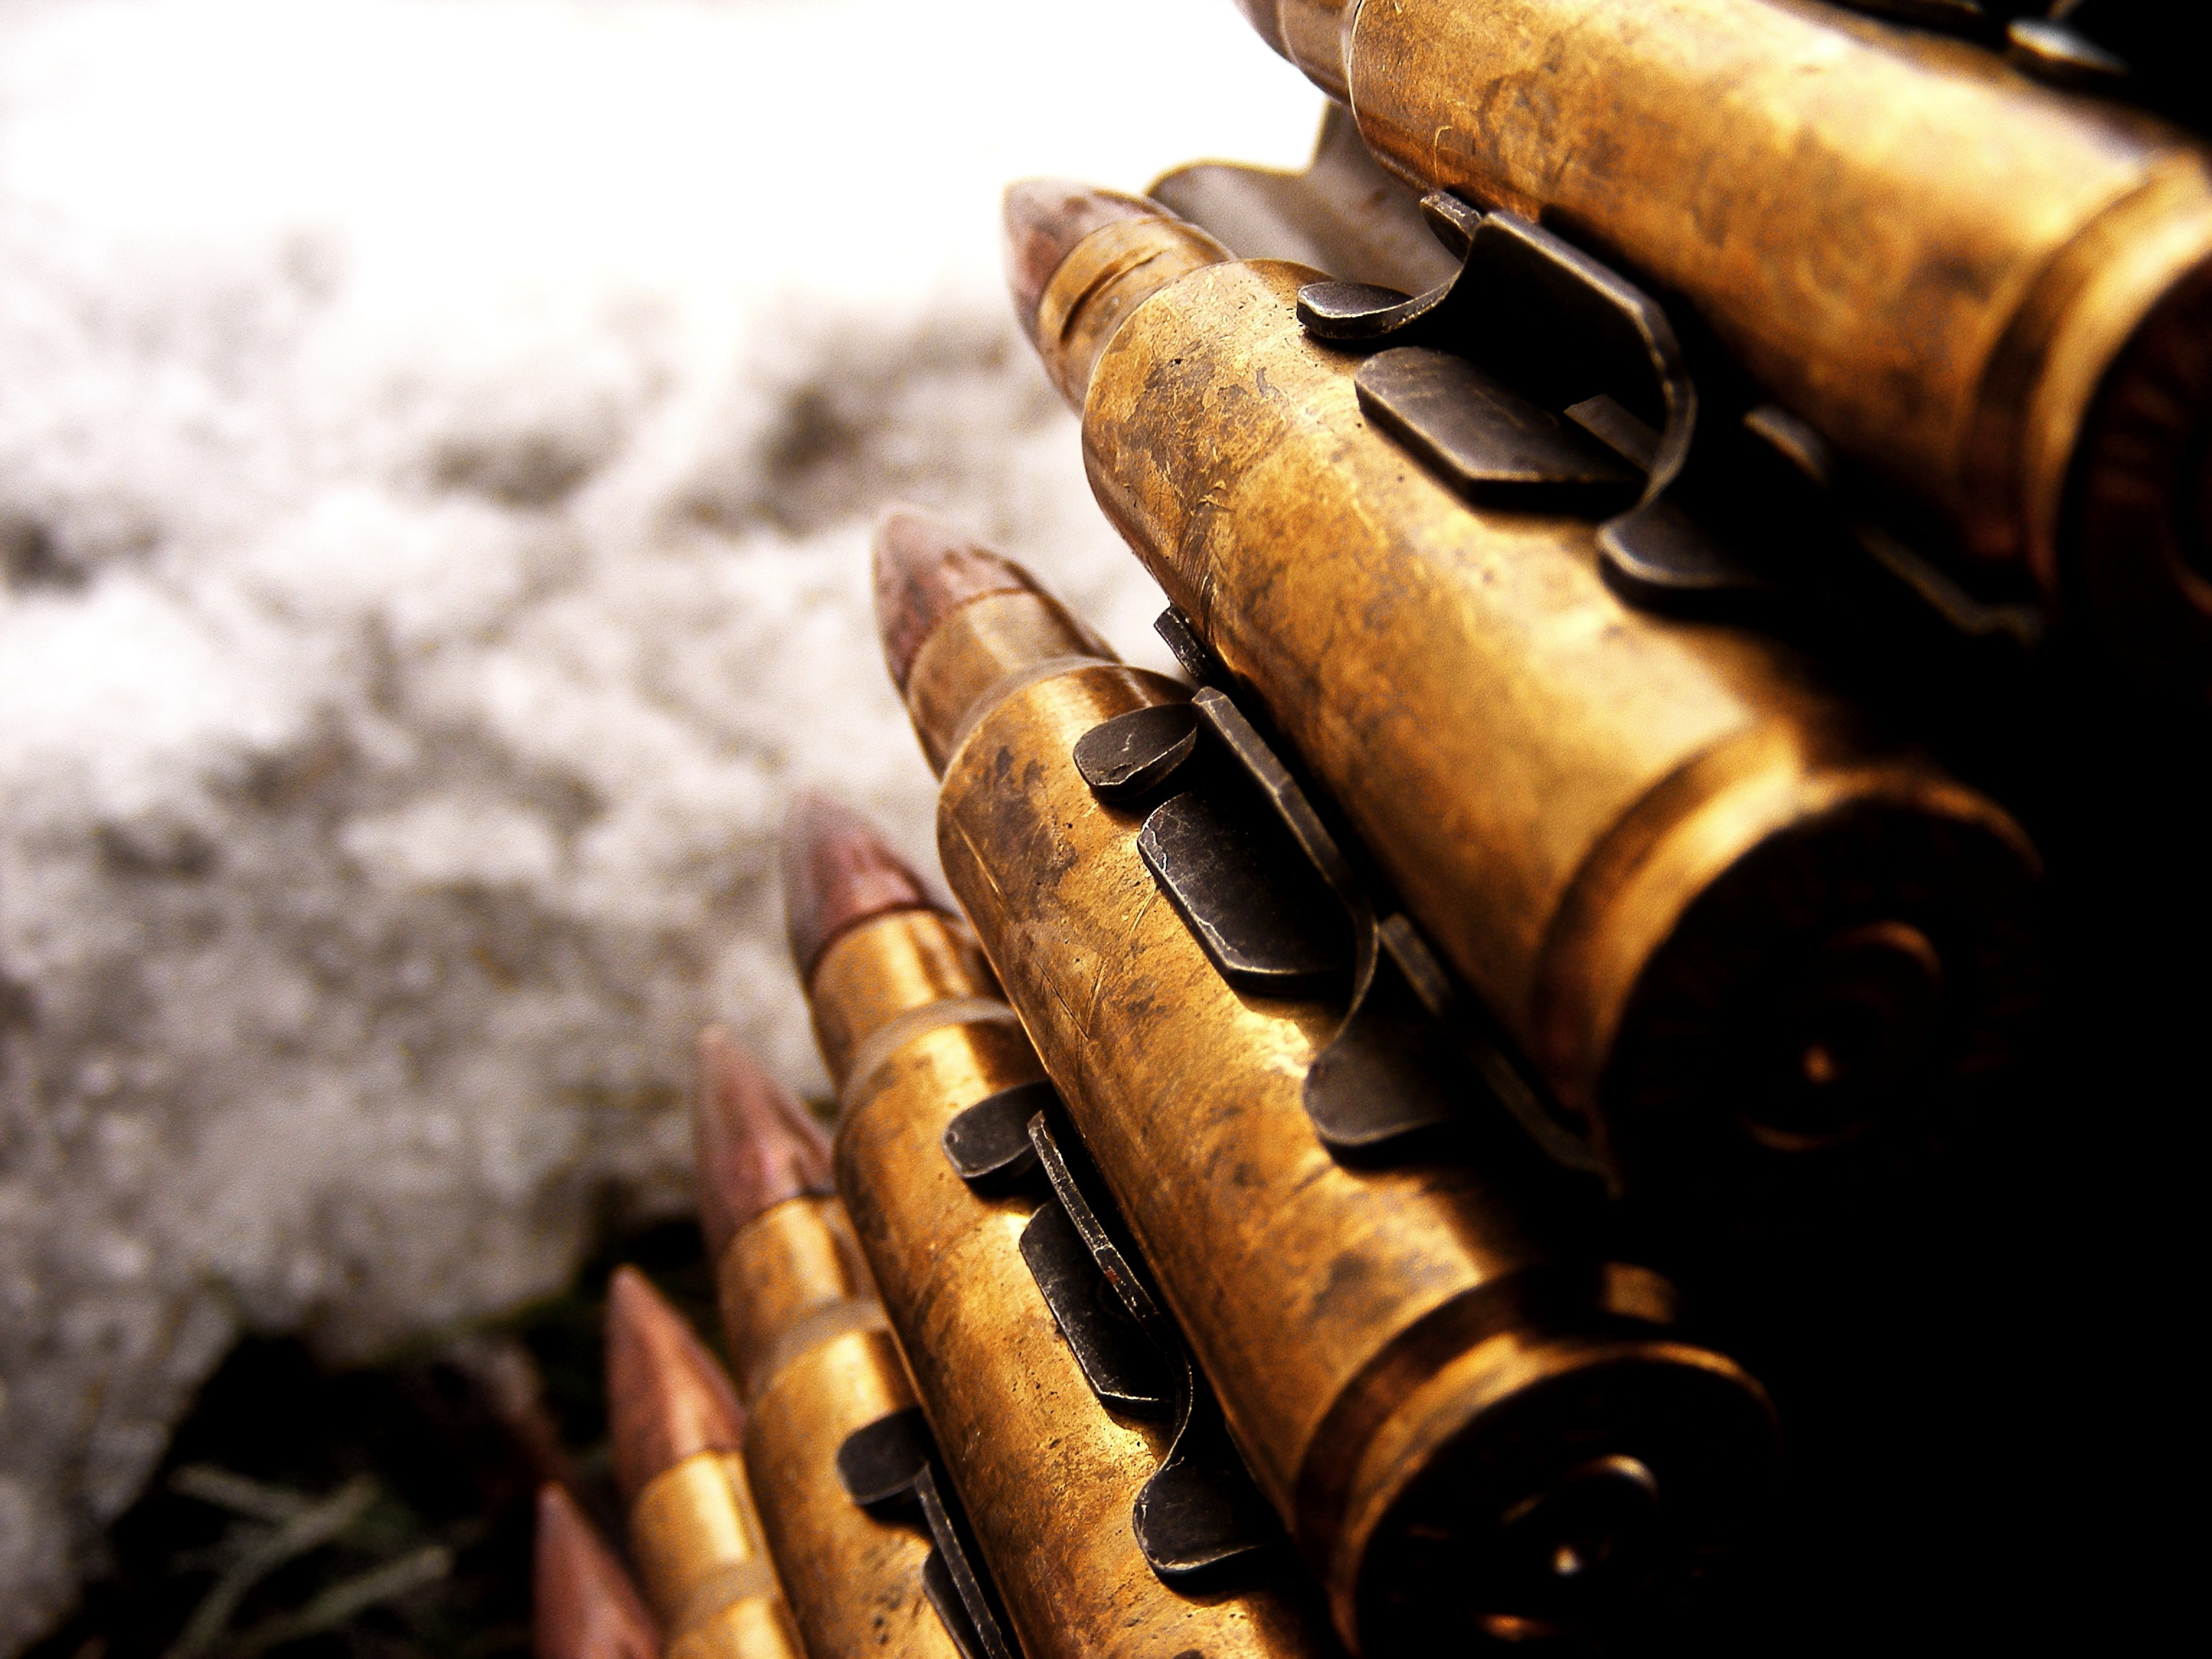 Download Military Gun Wallpaper 3072x2304 Full HD Wallpapers 3072x2304